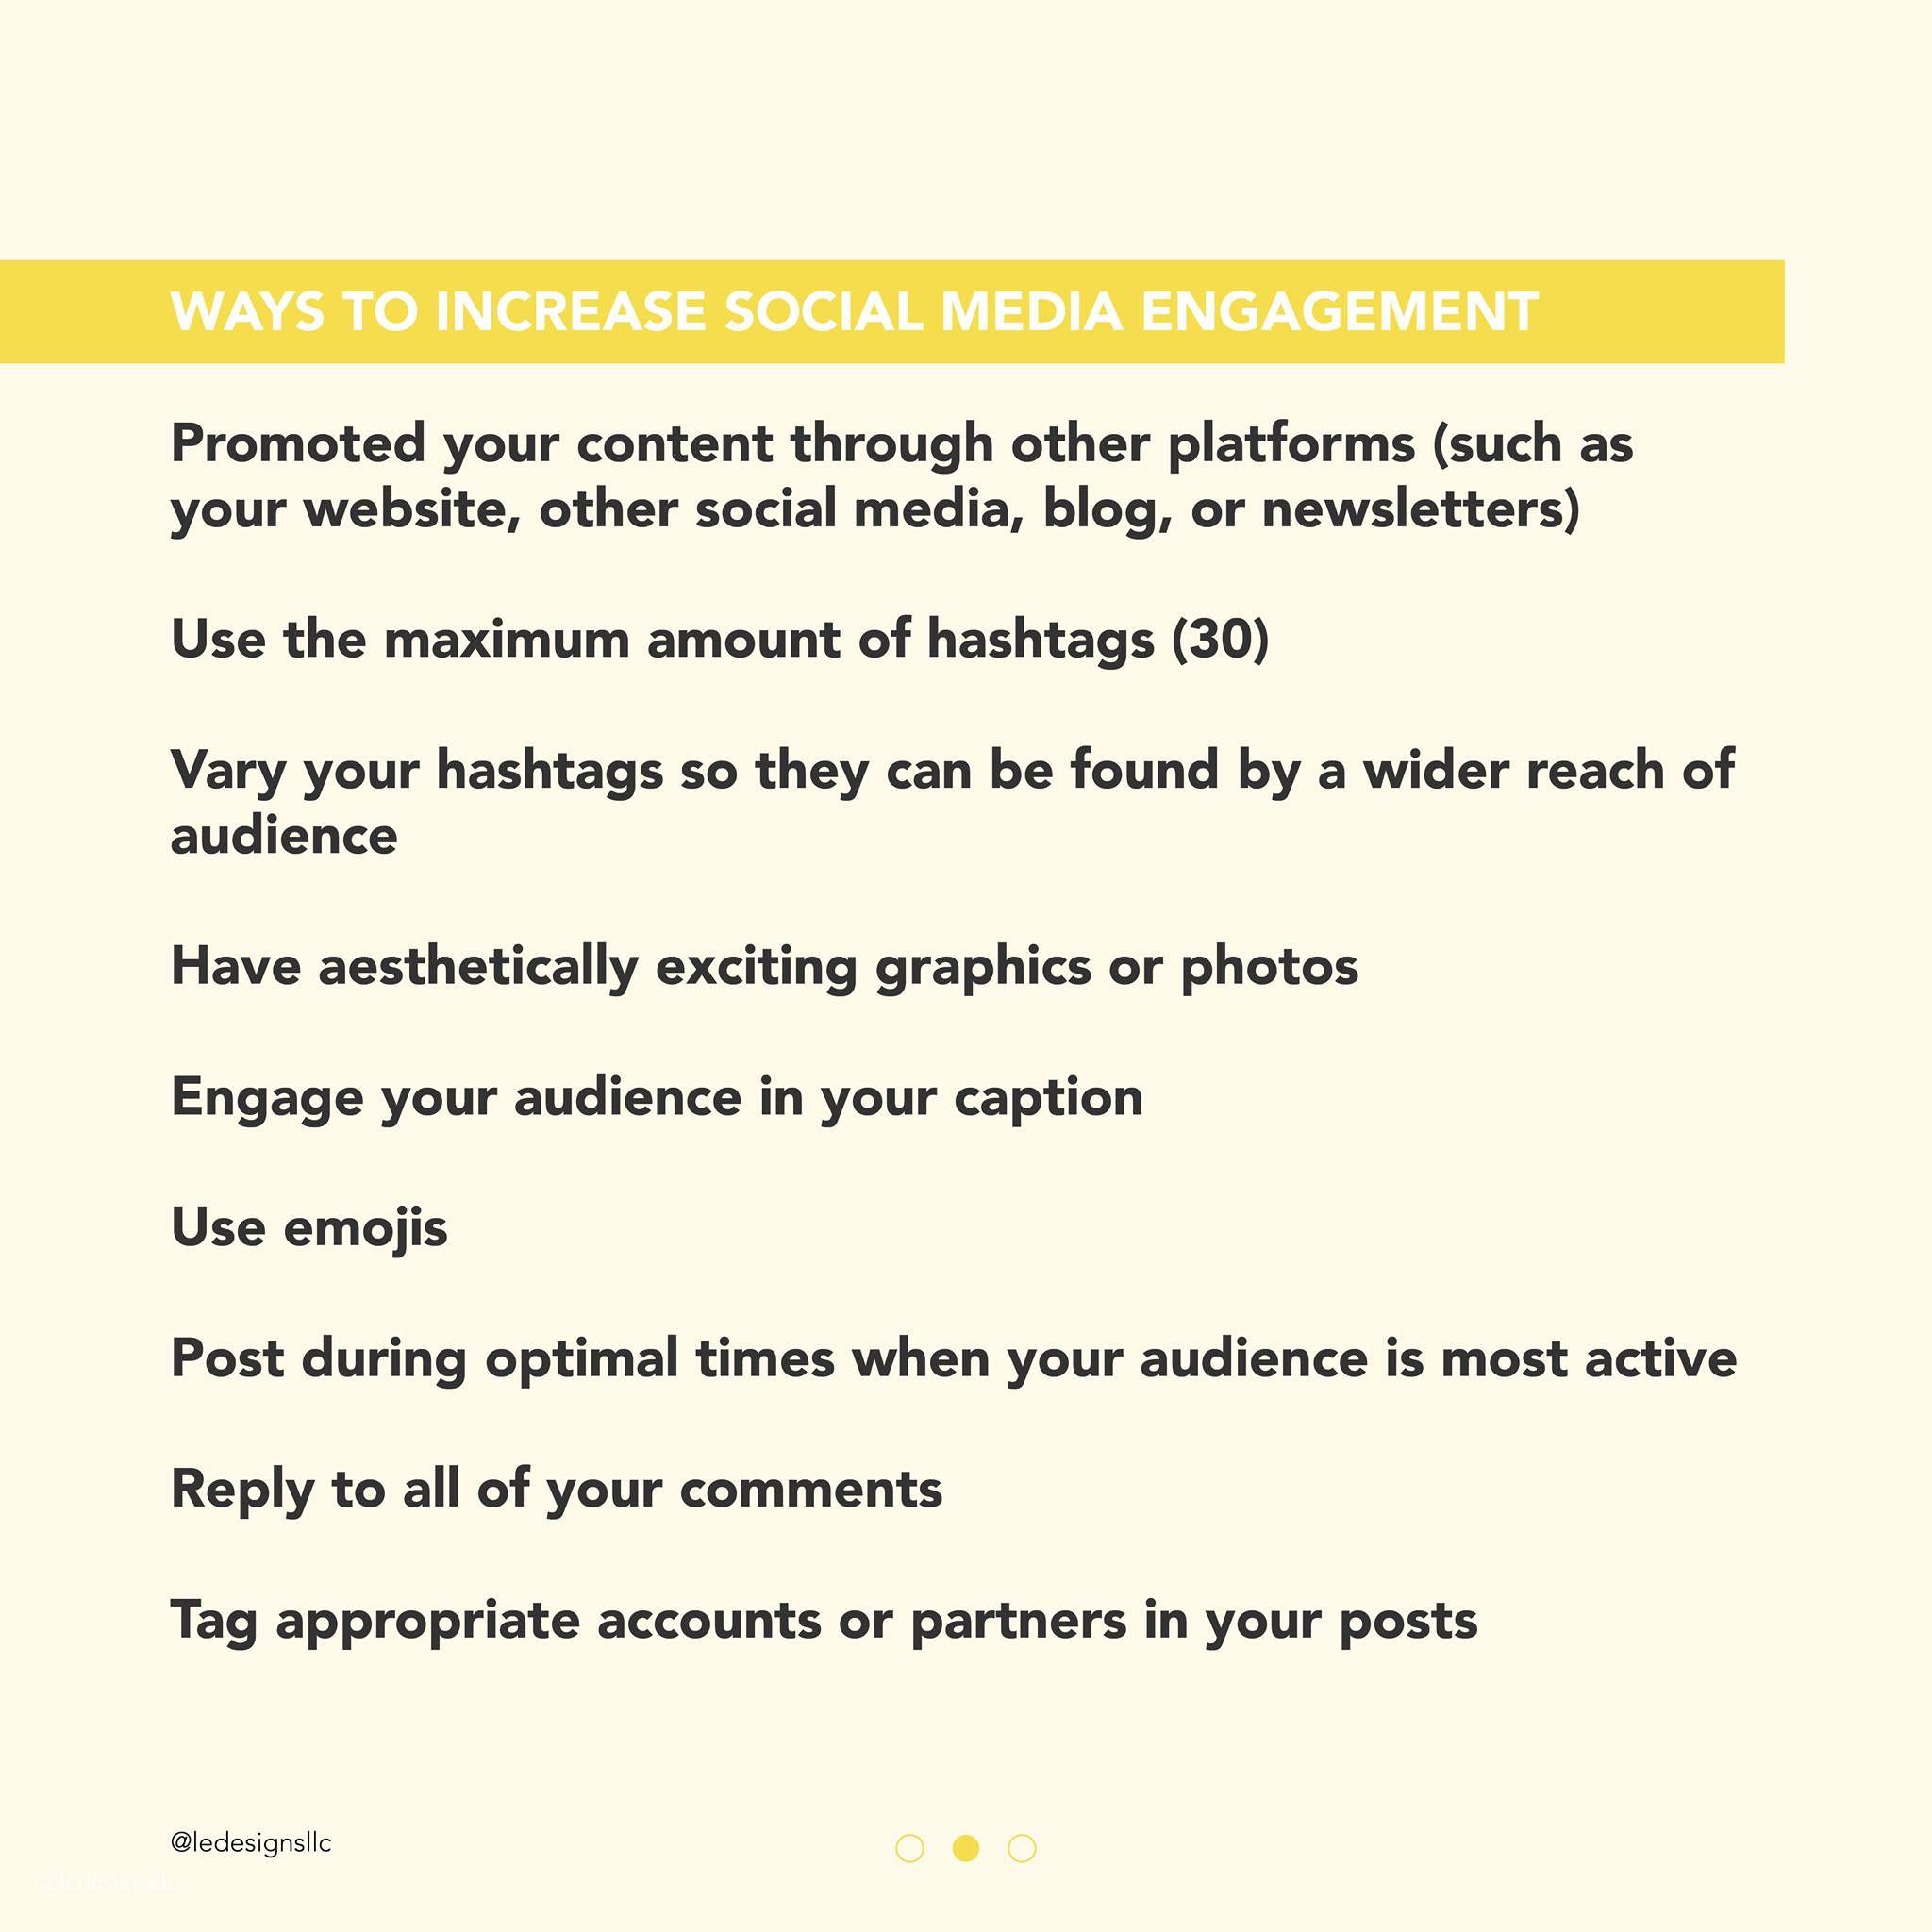 Ways To Increase Your Social Media Engagement On Instagram Facebook Pinterest Youtube Tiktok Social Media Engagement Social Media Ideal Audience